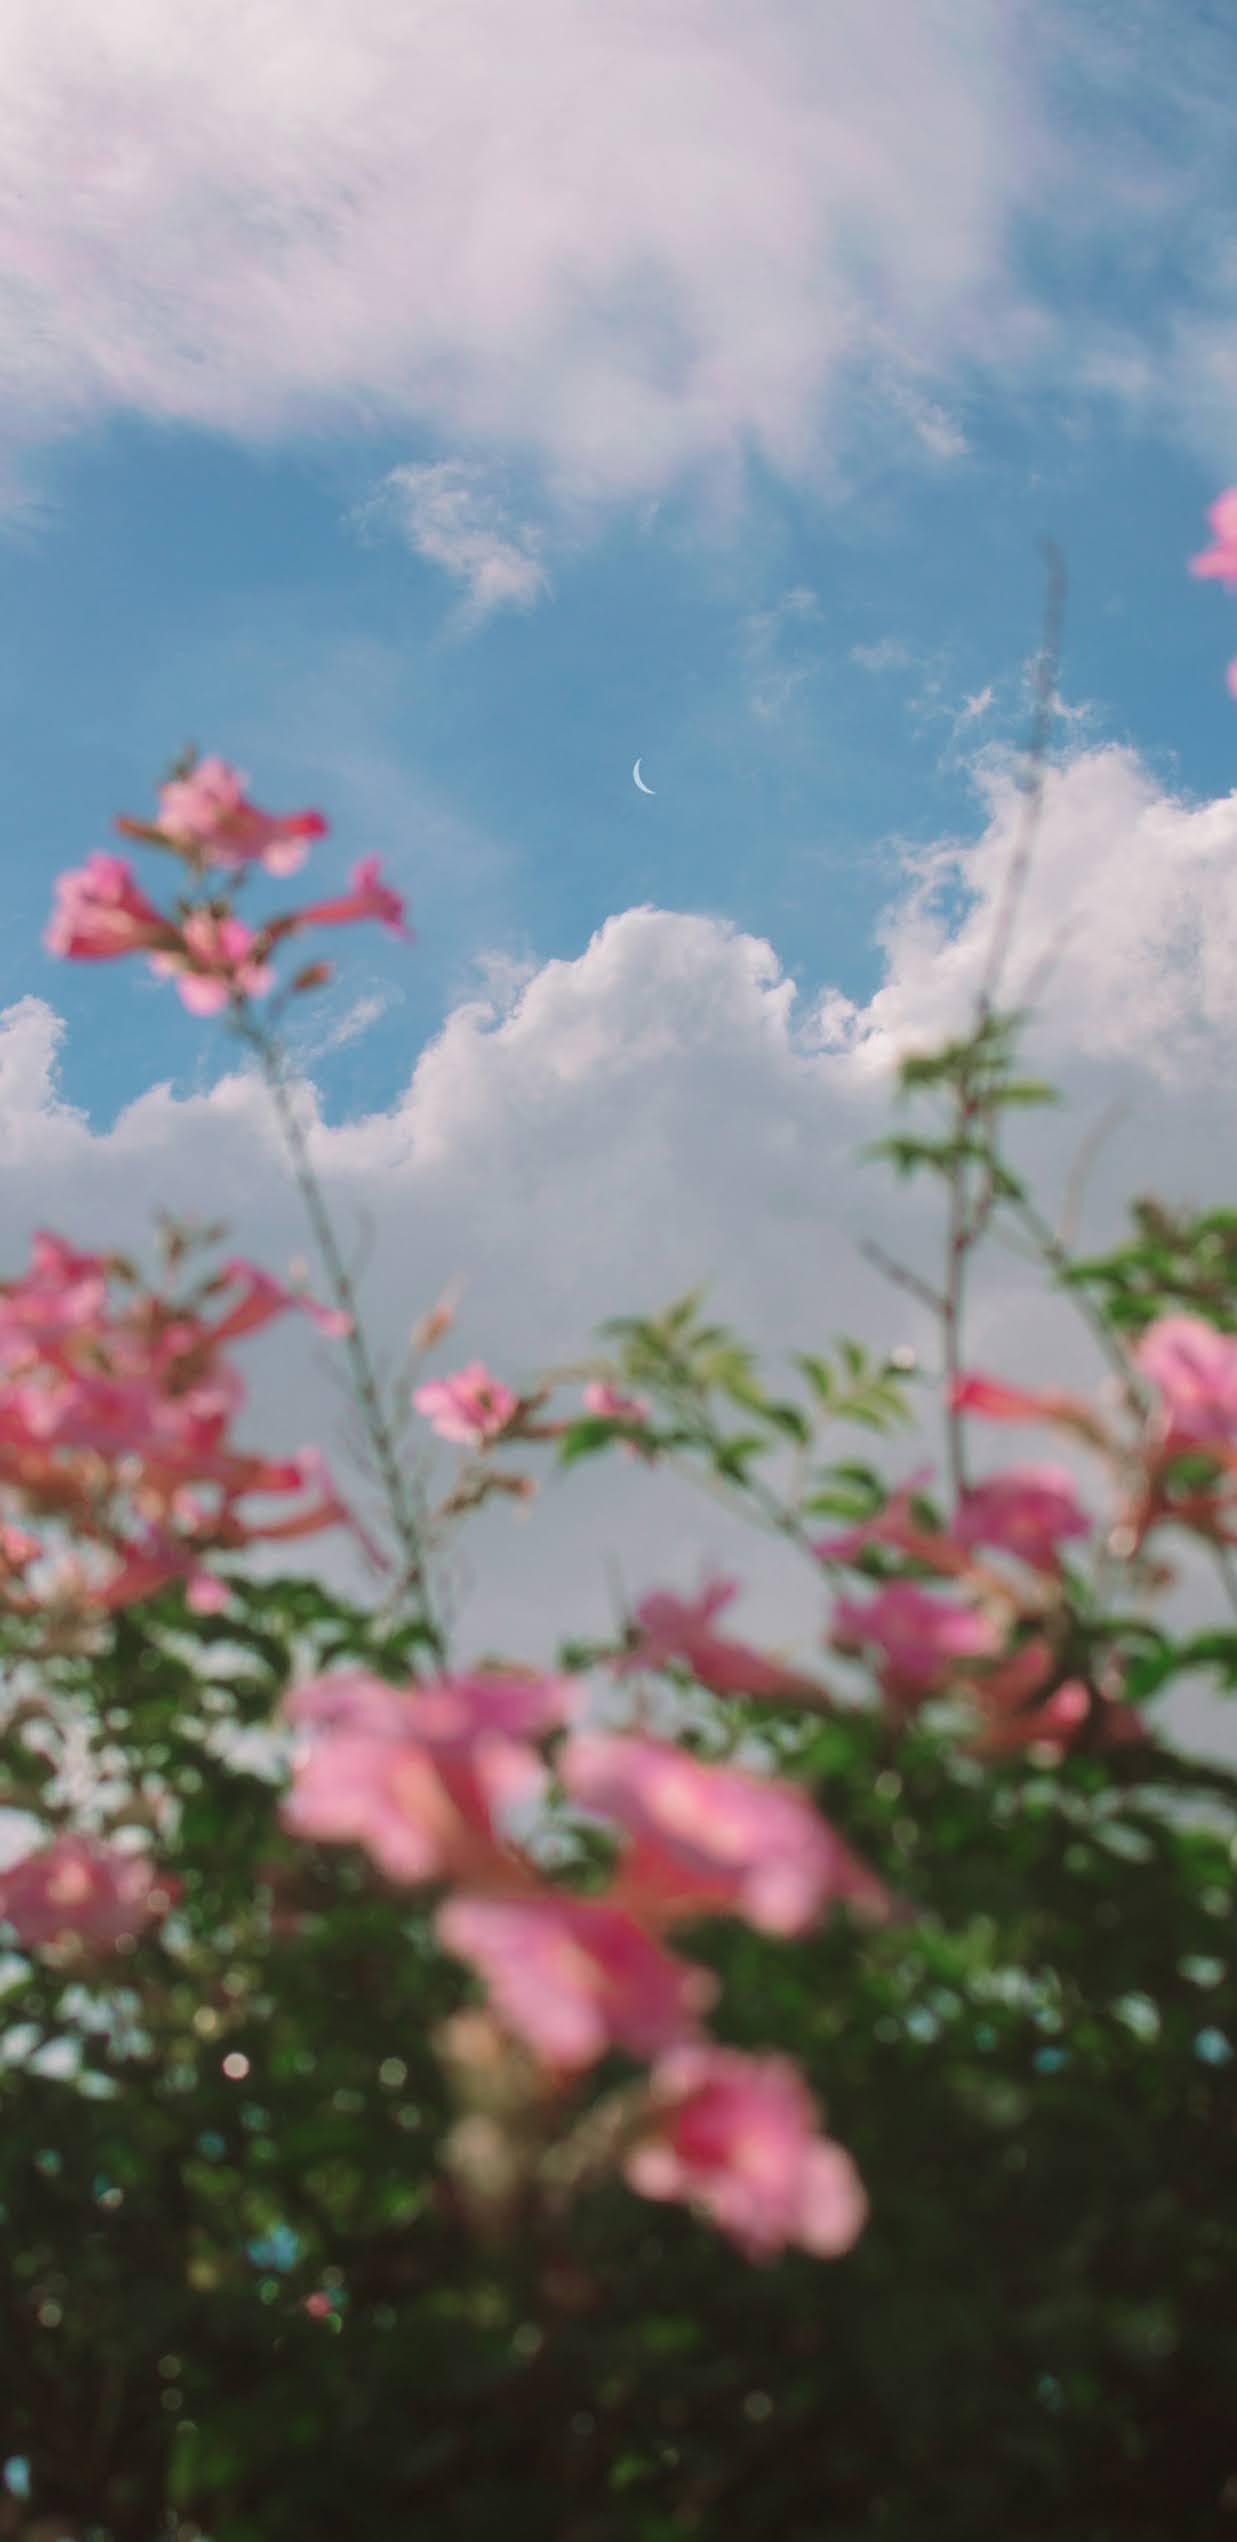 Flower under cloudy blue sky